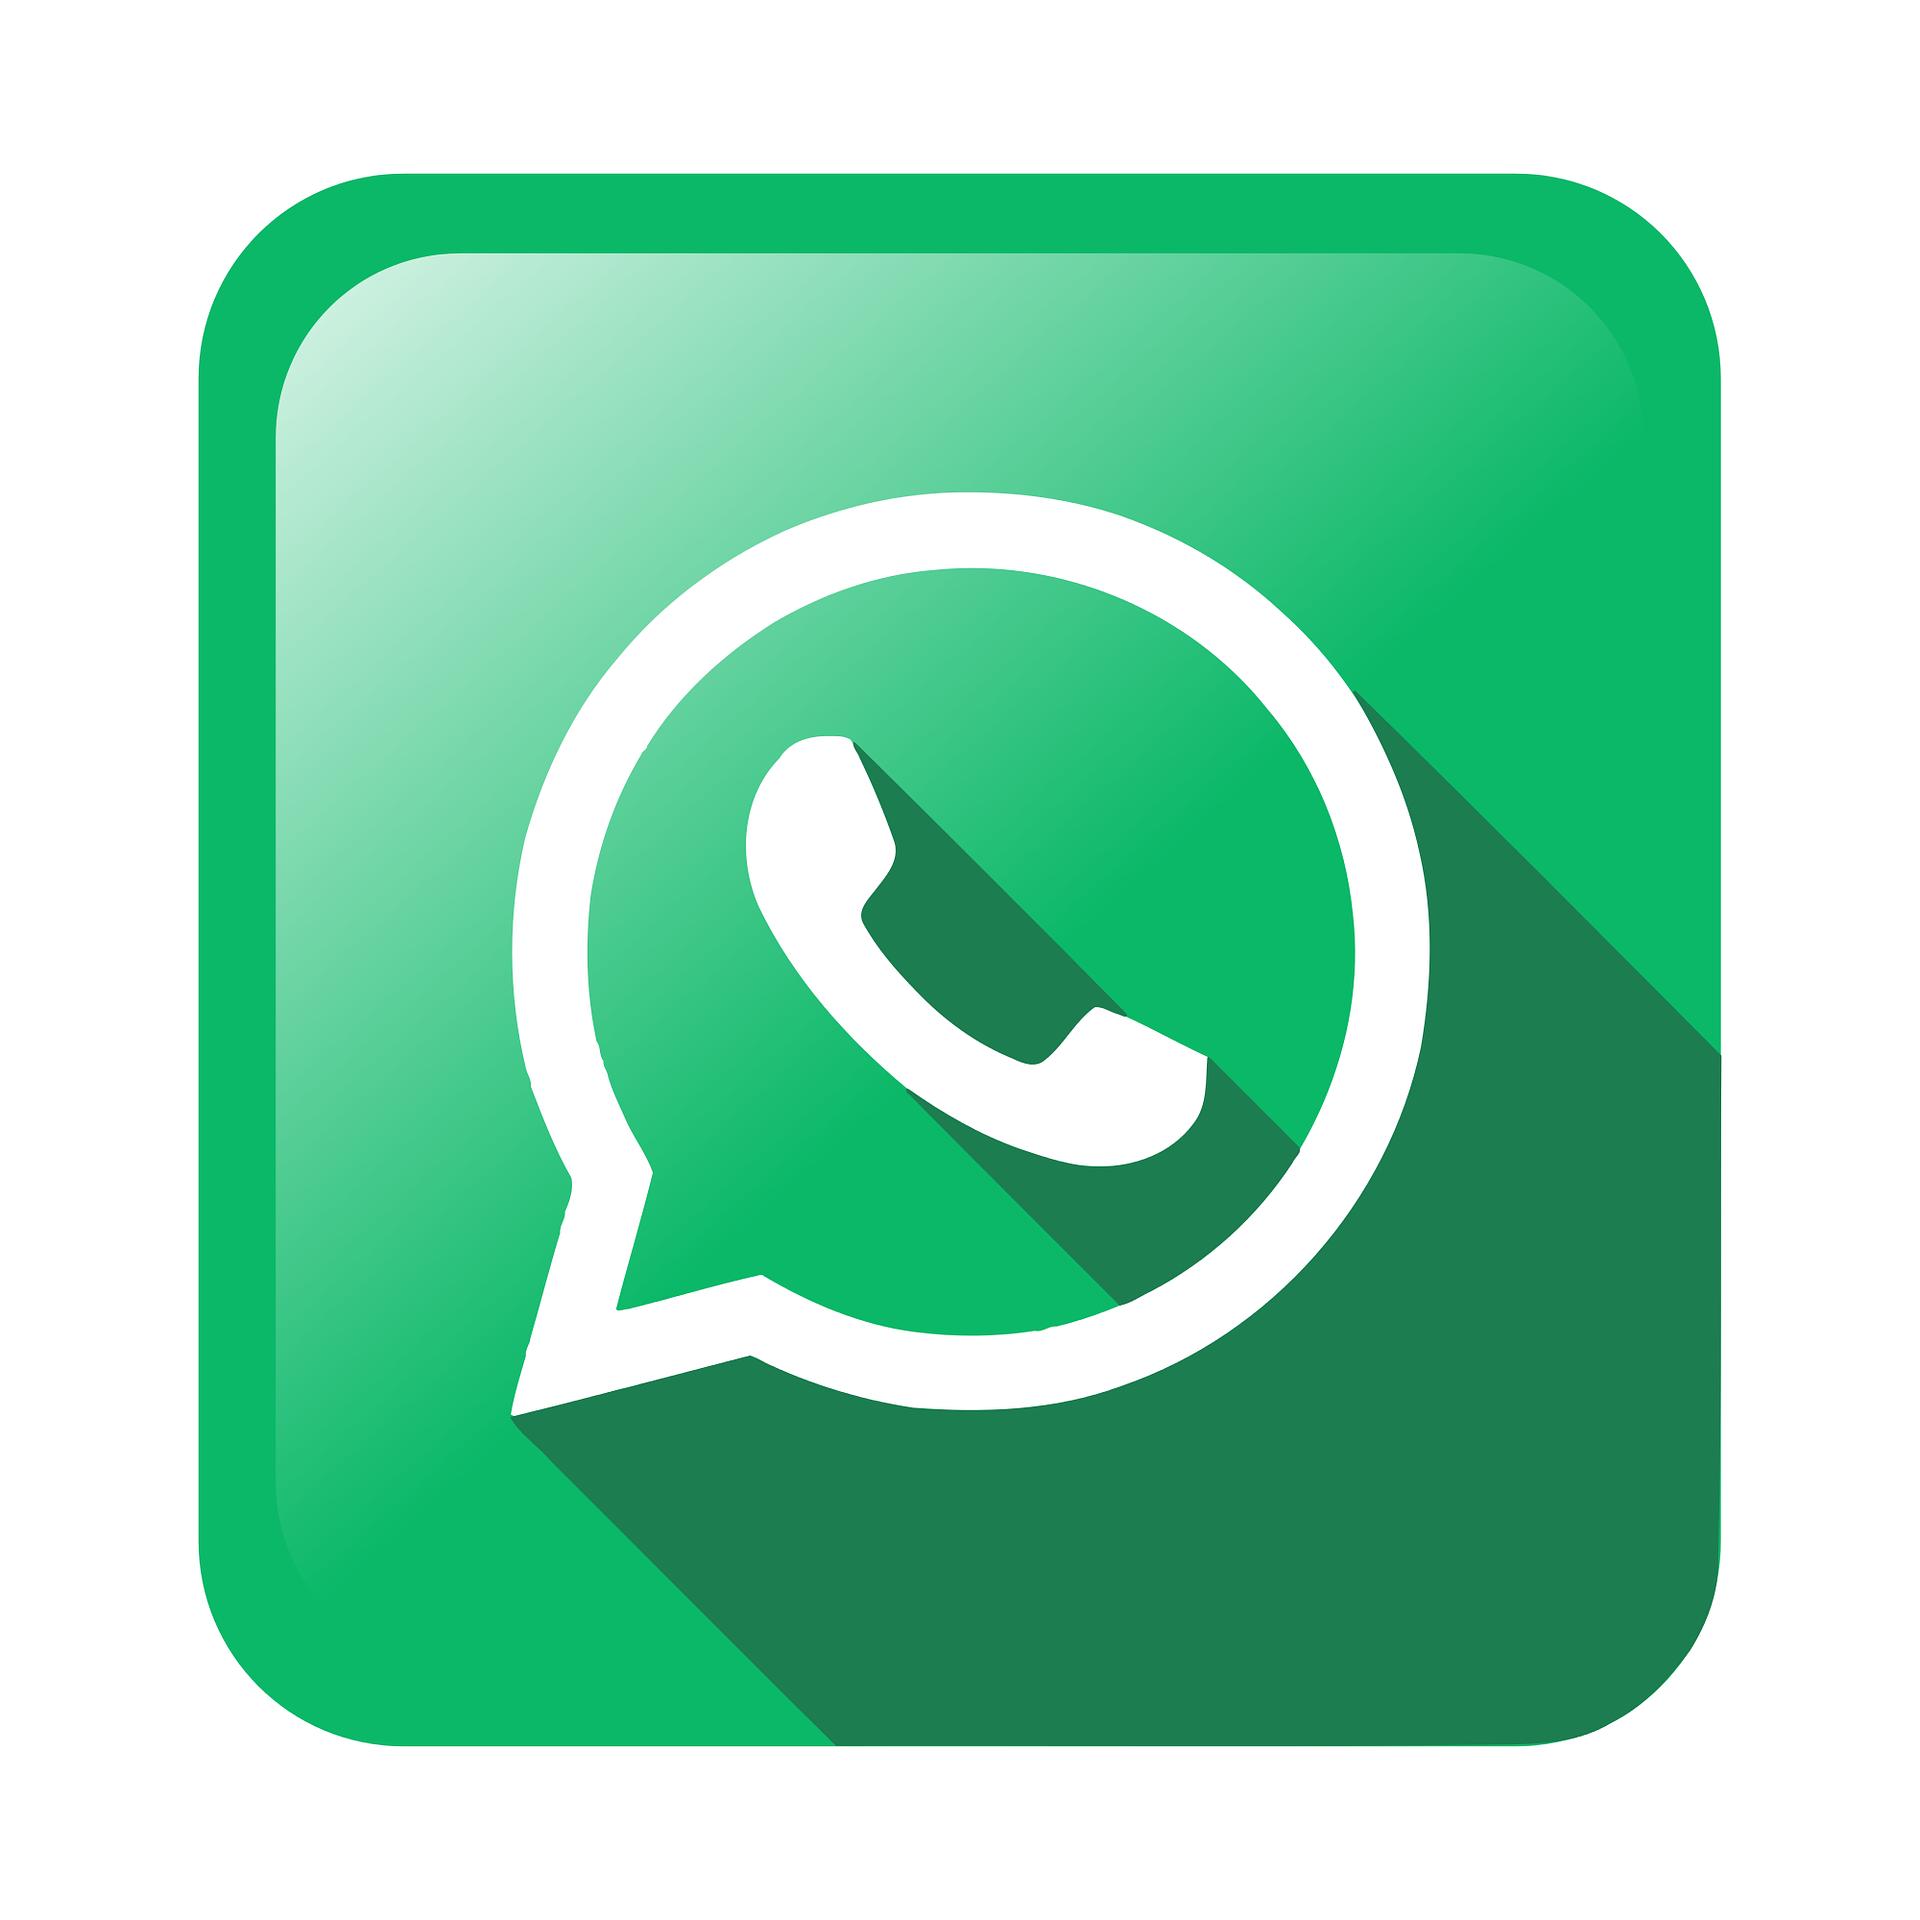 whatsapp gb pro 2021   Receita de brigadeiro gourmet, Brigadeiro para  vender, Bar de brigadeiro